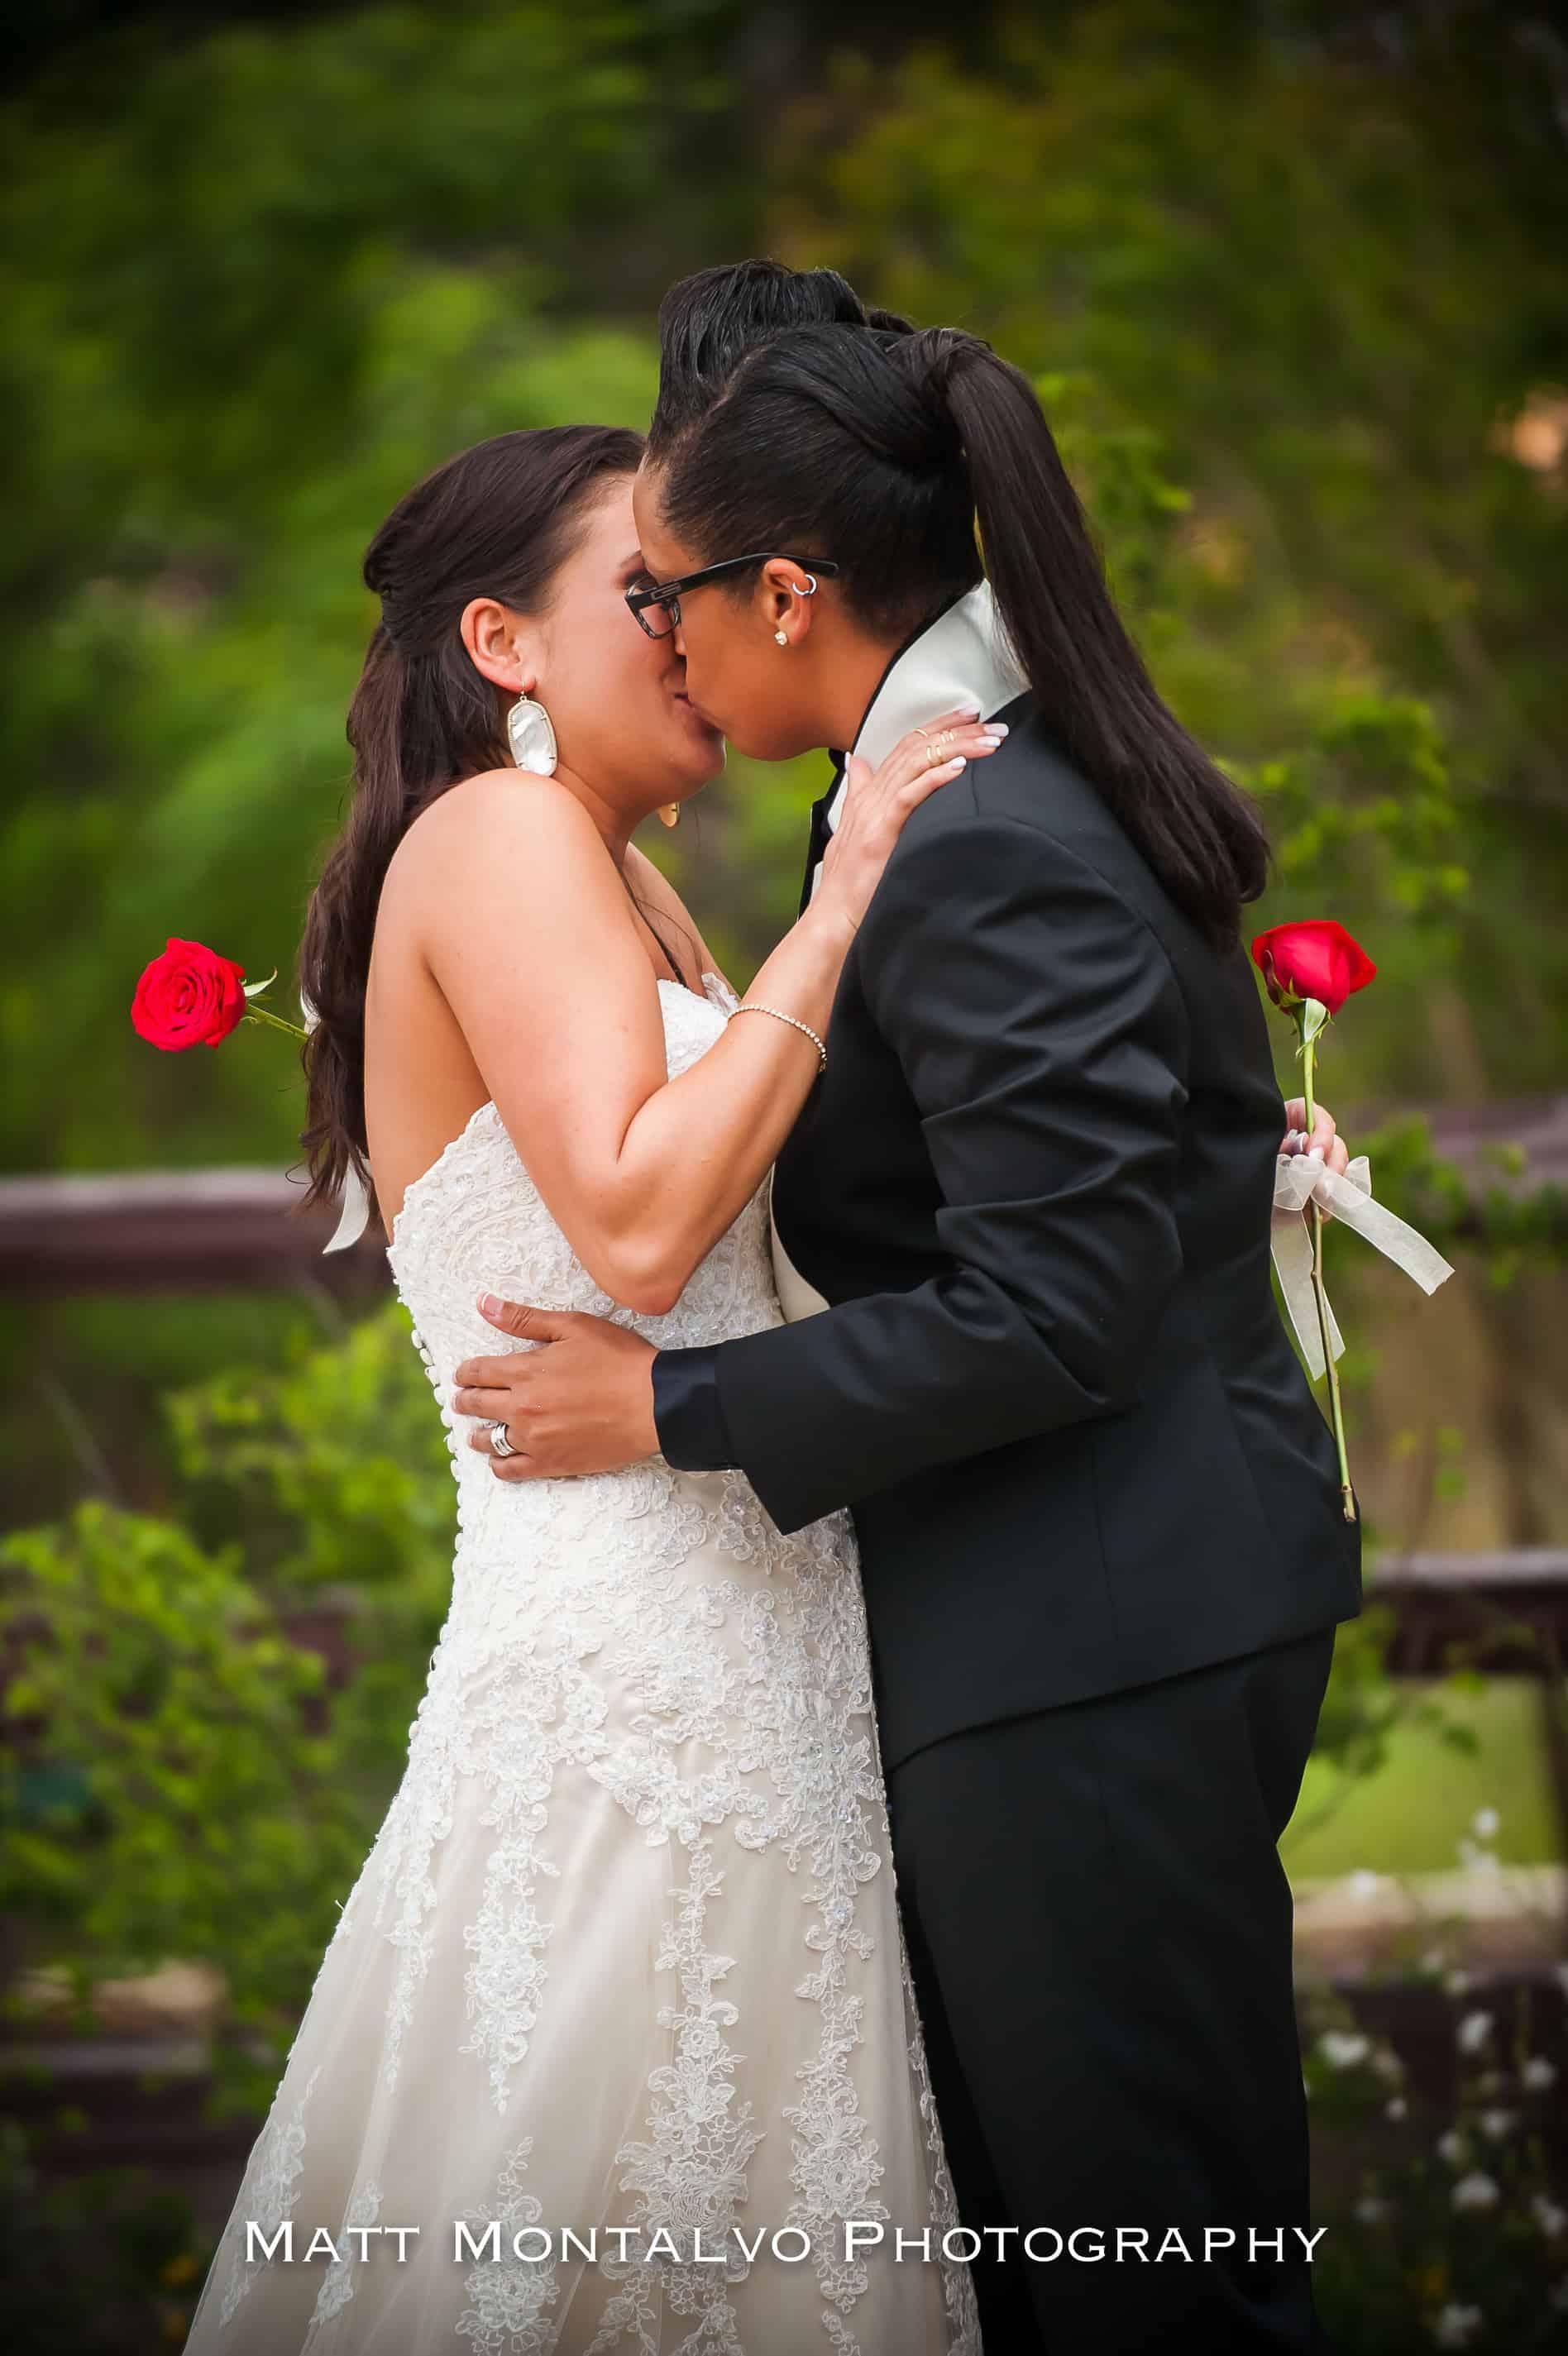 Same Sex Wedding Photography 21 Matt Montalvo Photography